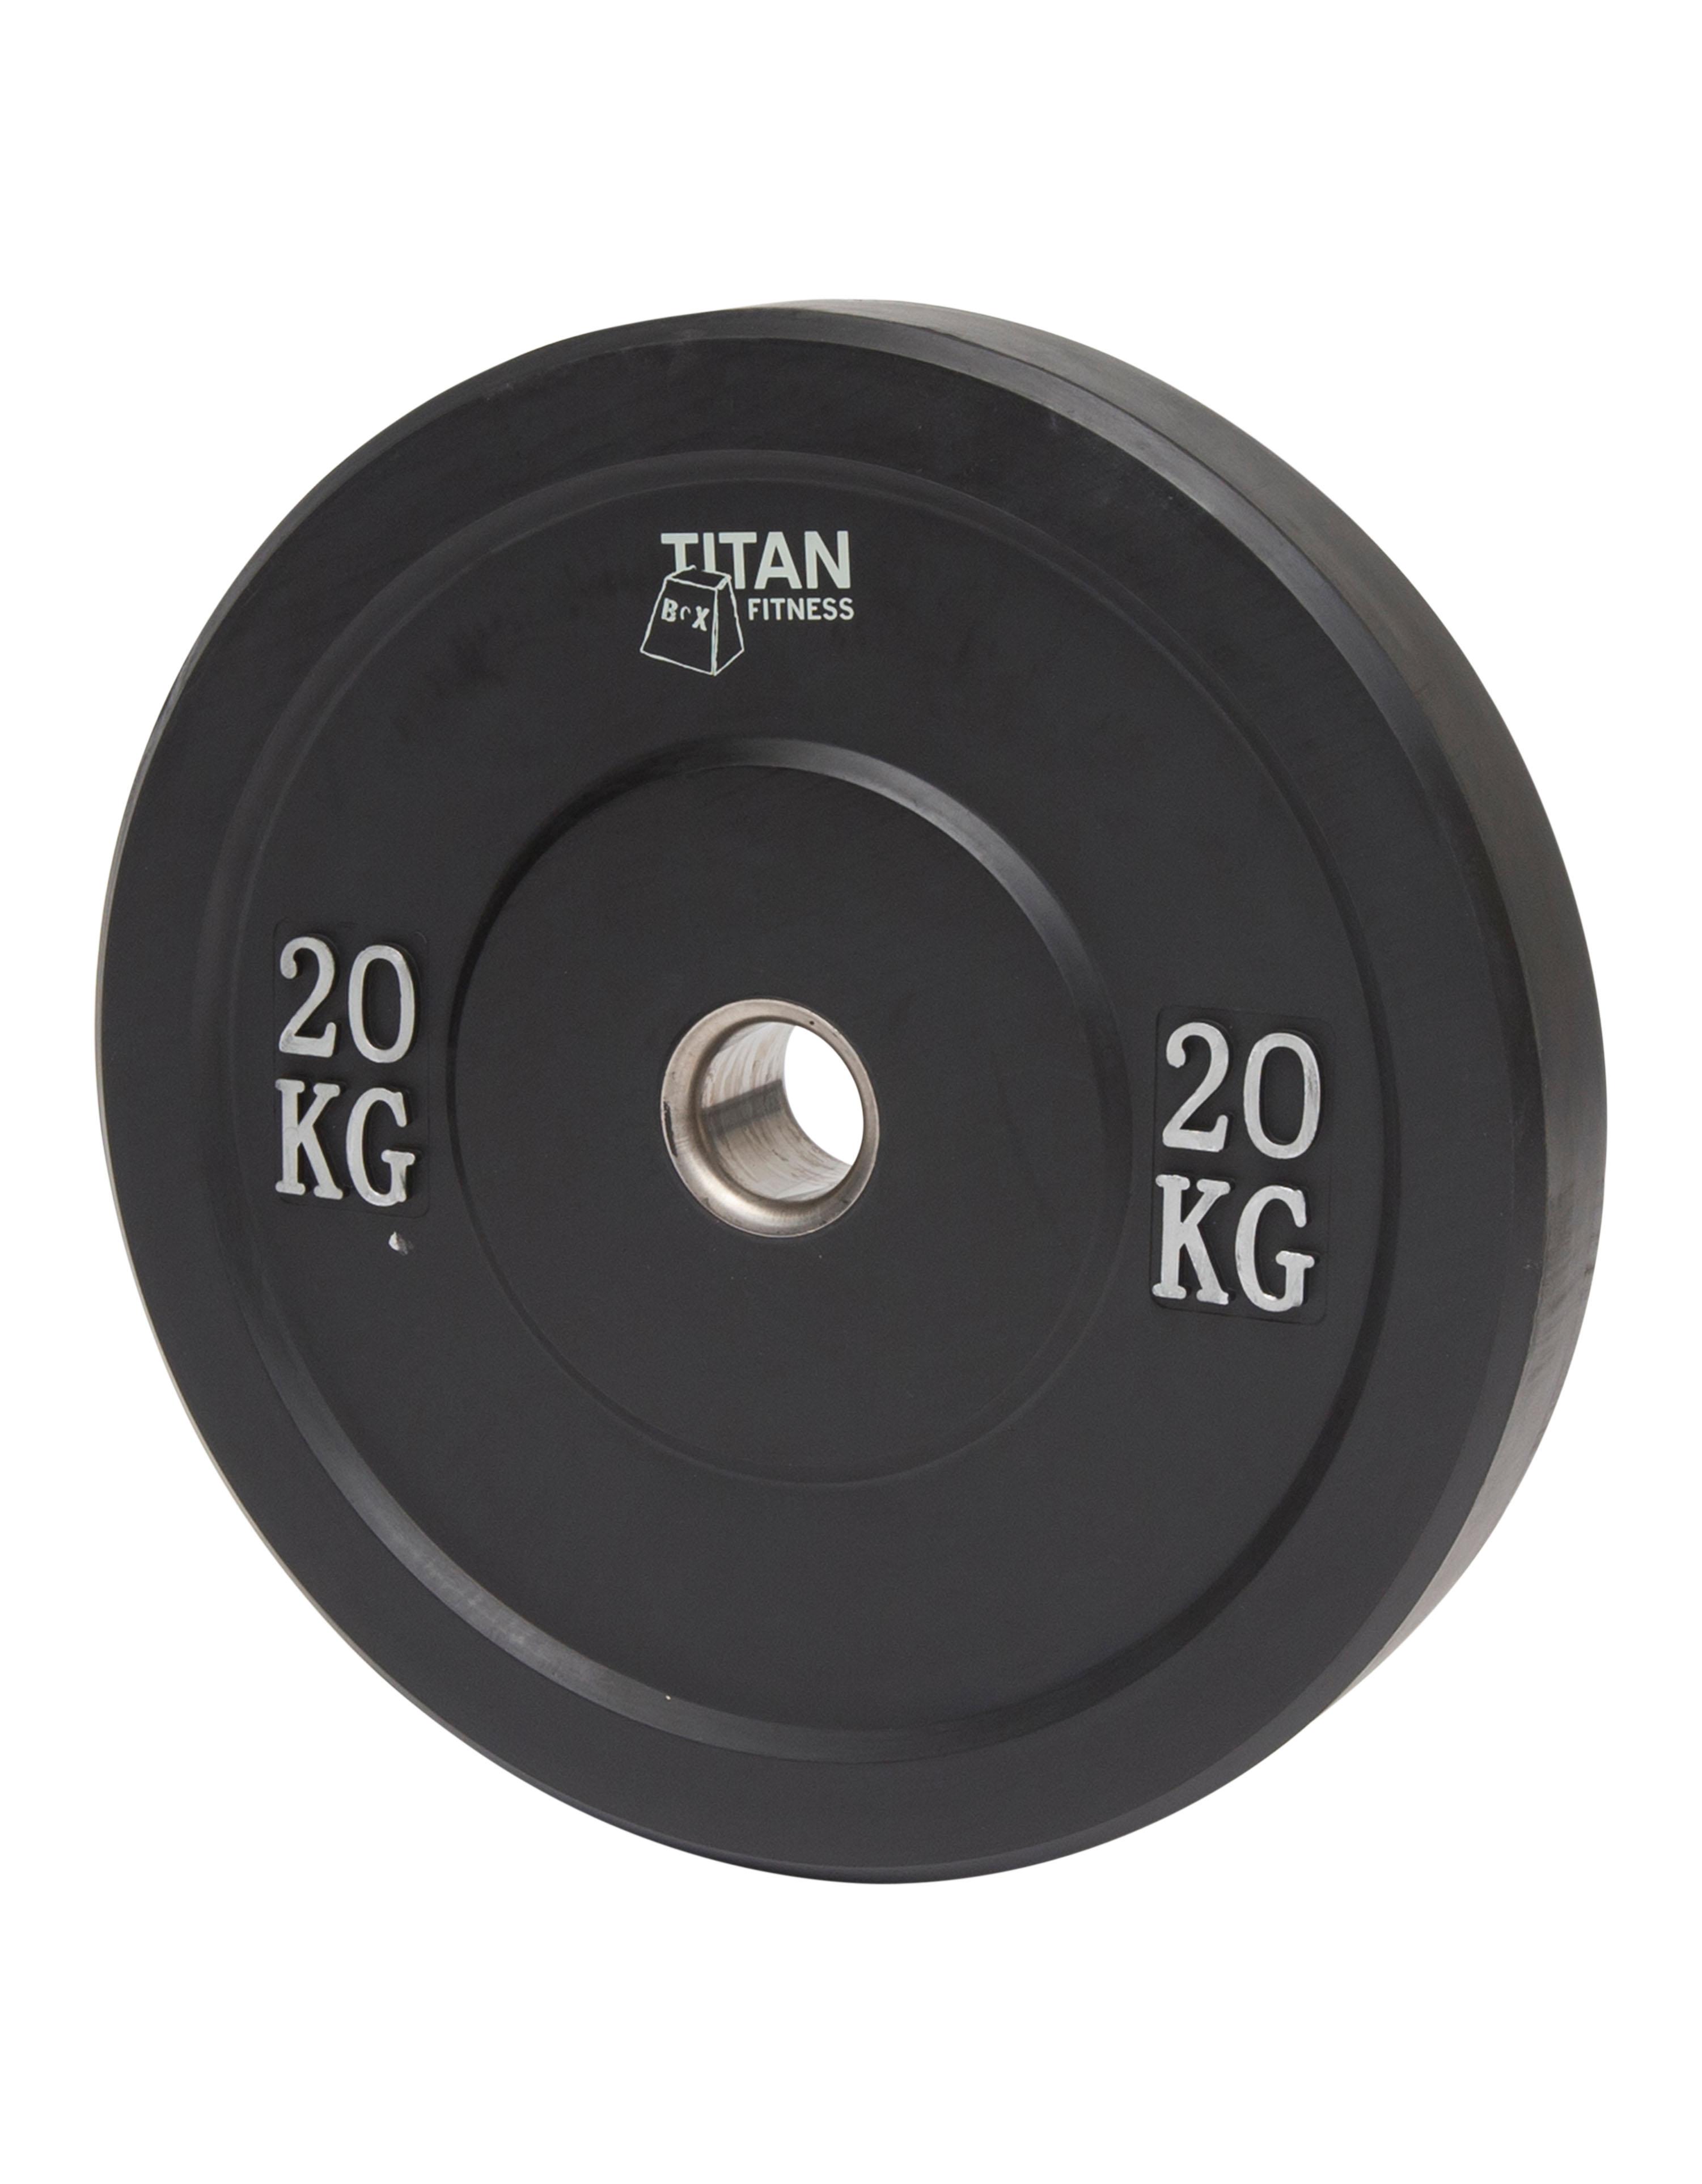 Titan BOX Bumper plates 20 kg Black